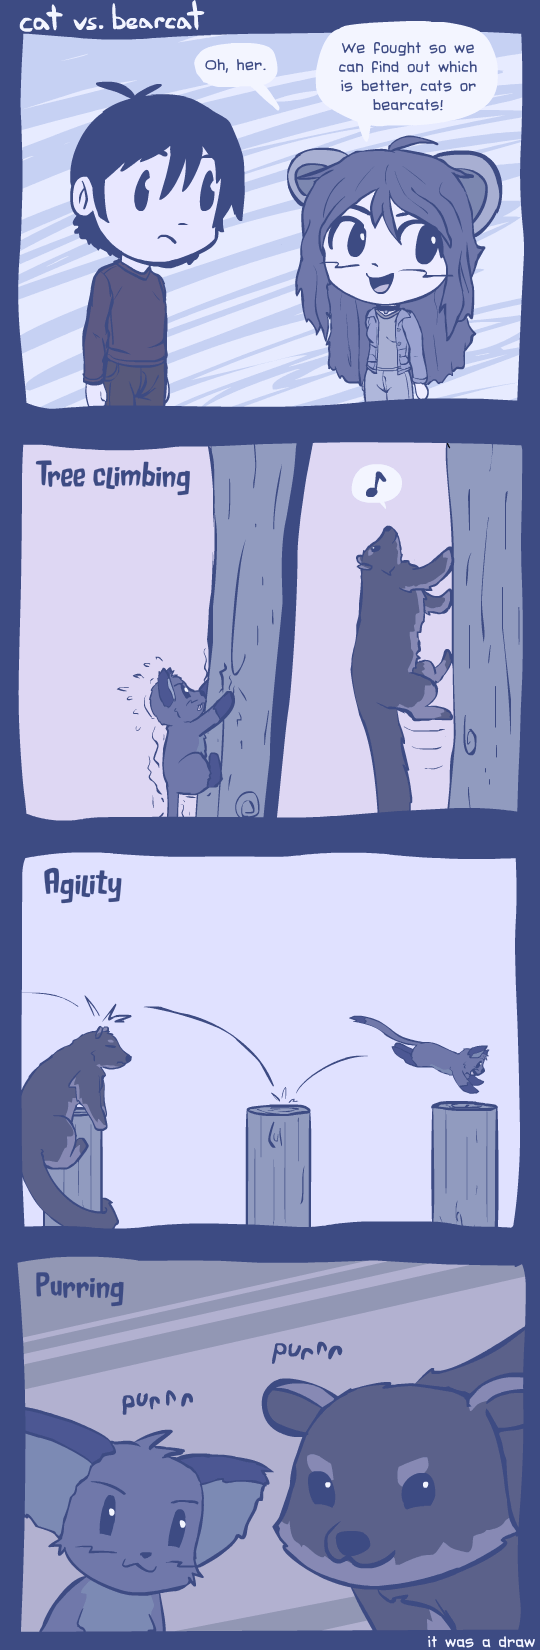 cat vs bearcat by radstylix